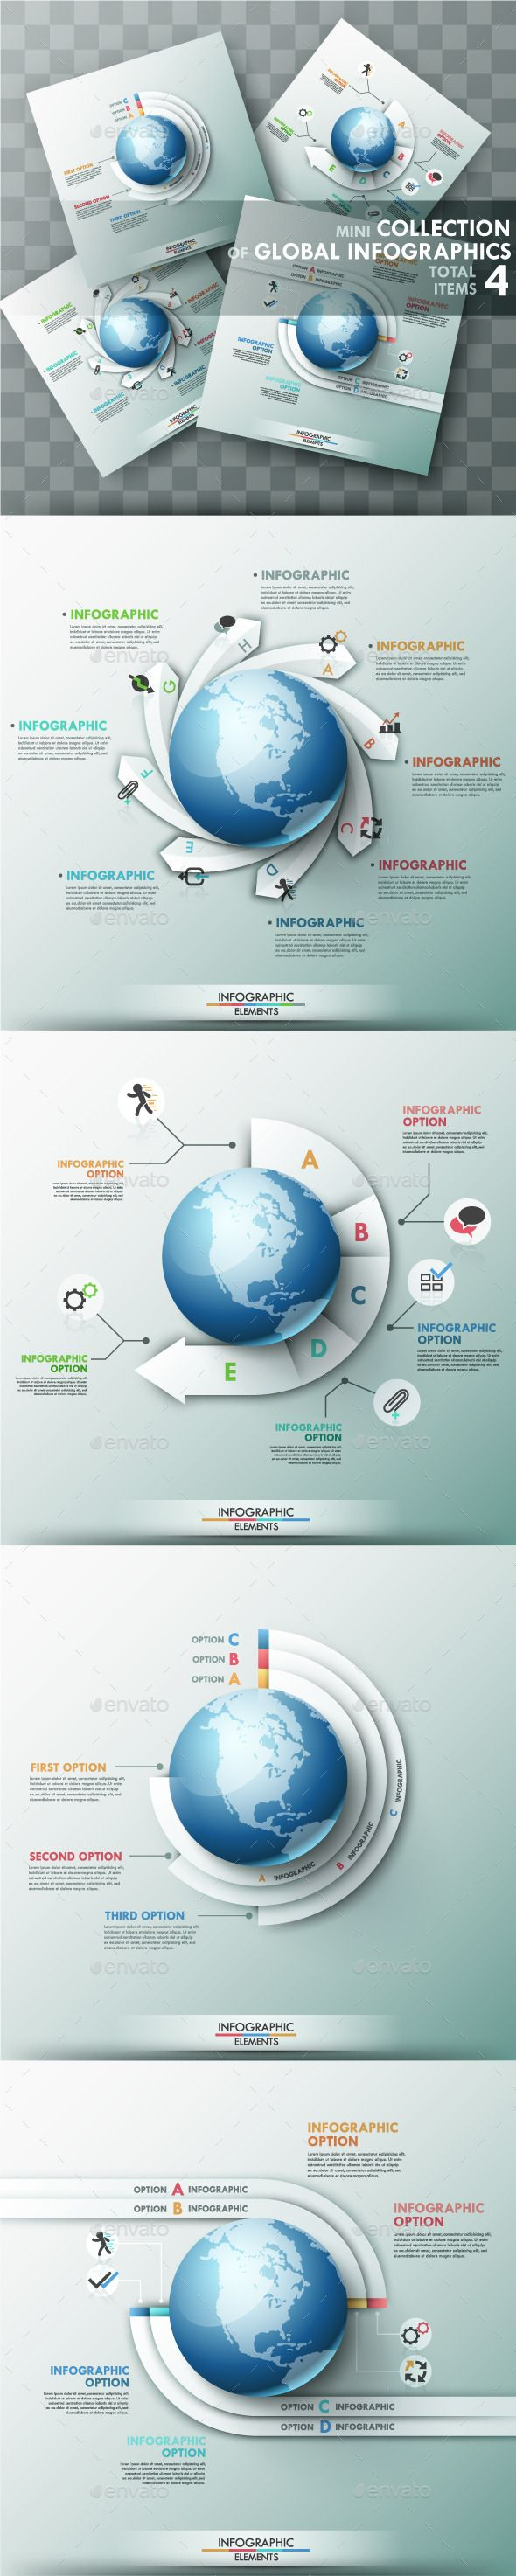 Set of 4 Global Templates PSD, EPS, AI #design Download: http://graphicriver.net/item/set-of-4-global-templates/9848507?ref=ksioks